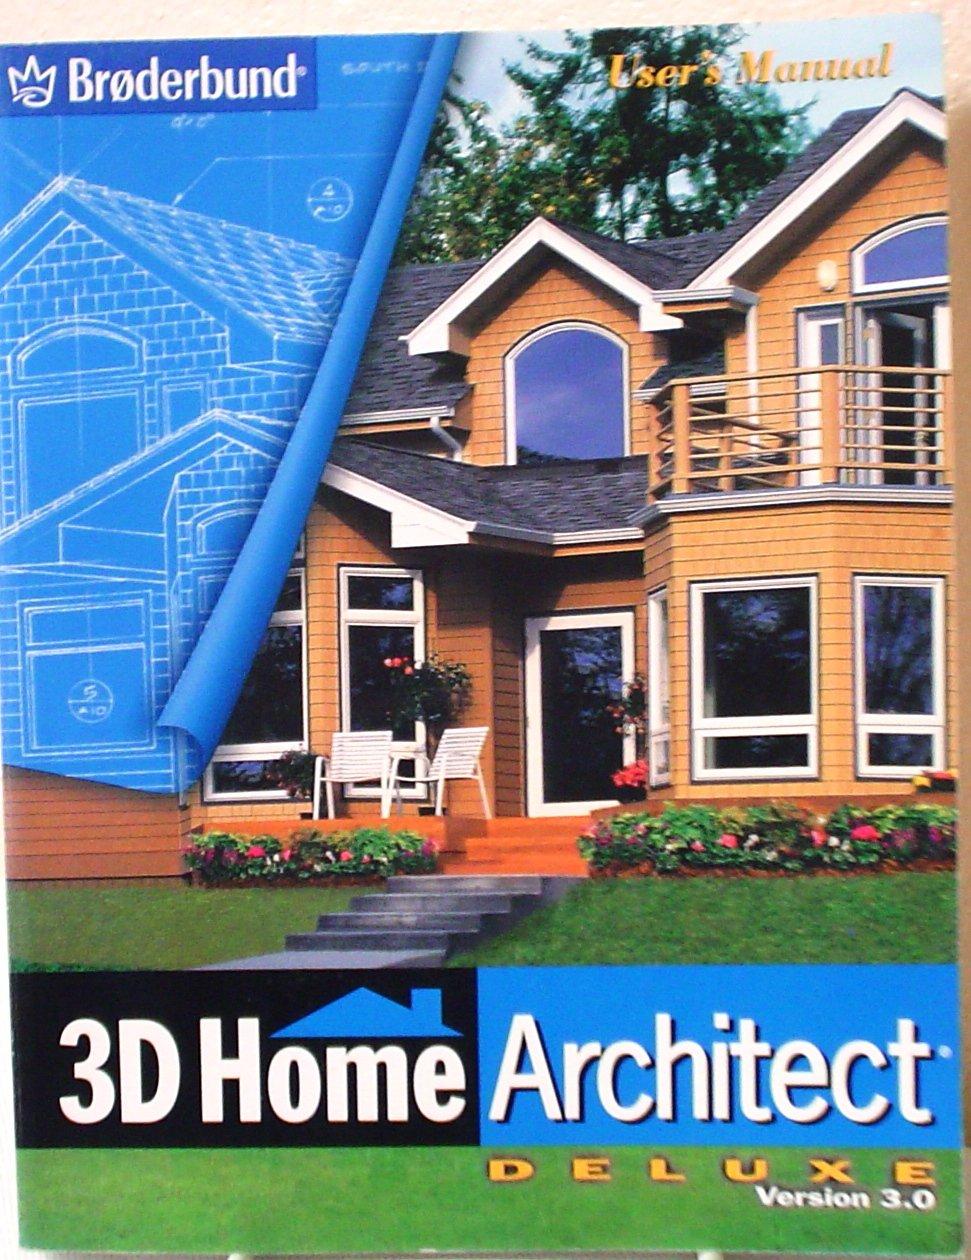 3D Home Architect Deluxe Version 3.0: Broderbund: Amazon.com: Books